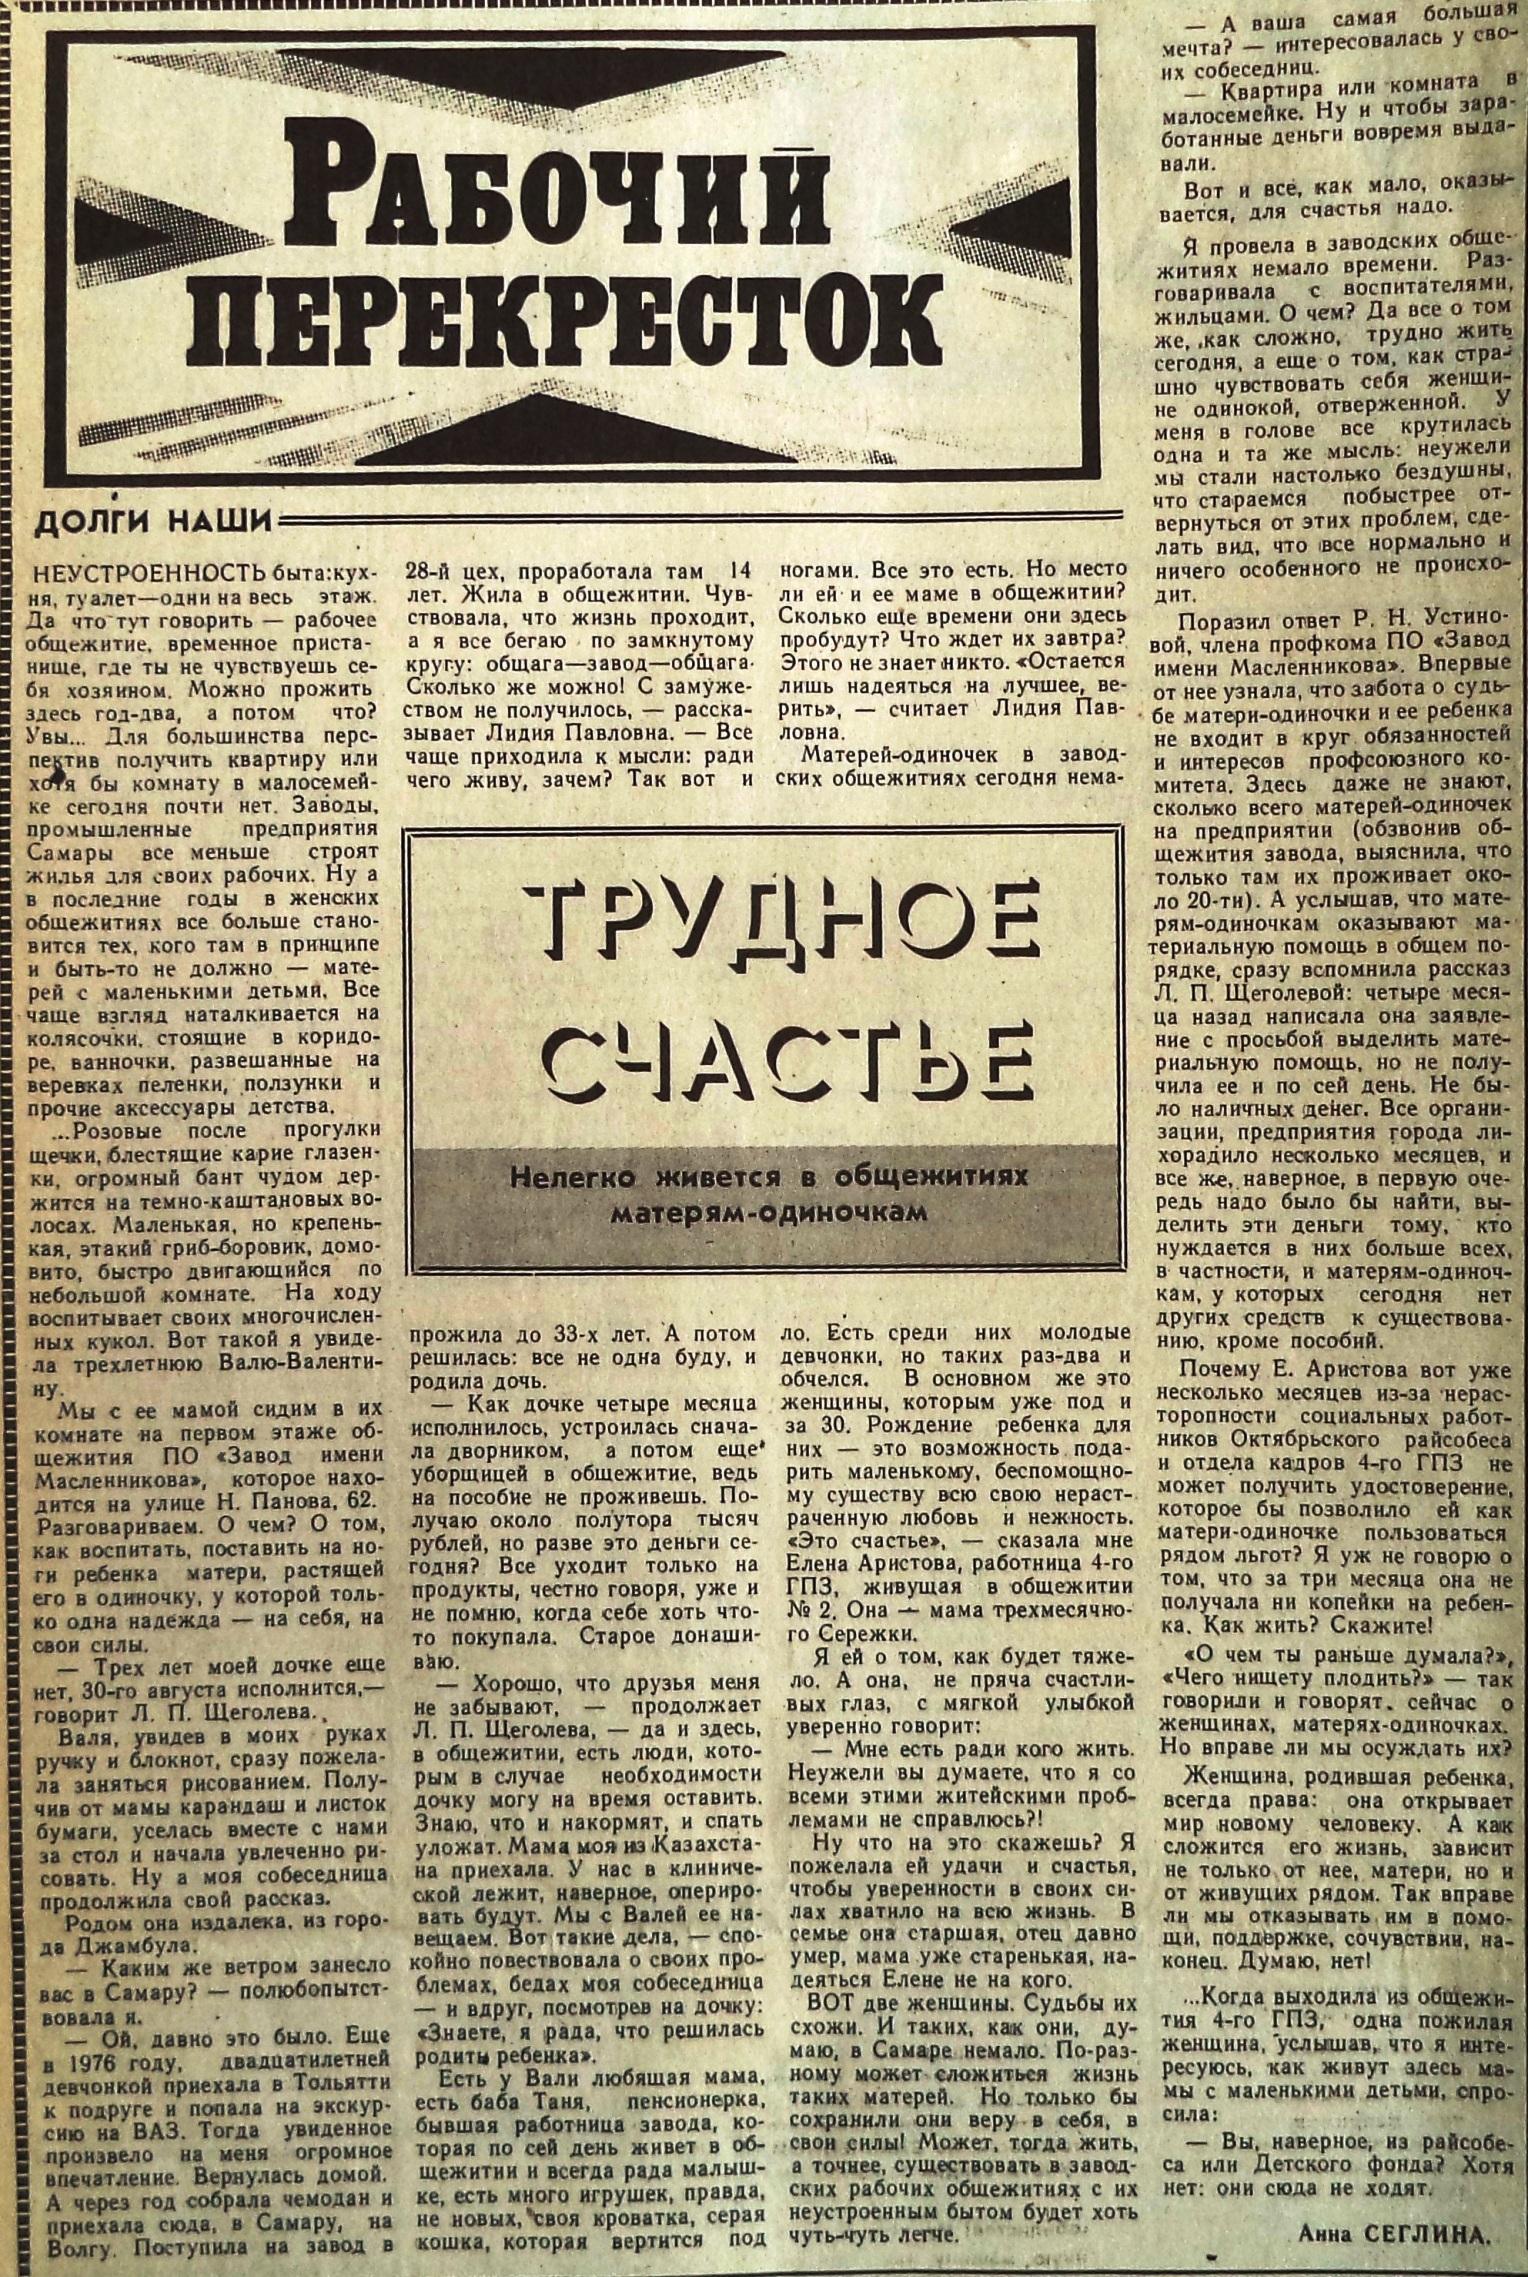 VZya-1992-08-04-probl_obschezh_na_NikPan-62